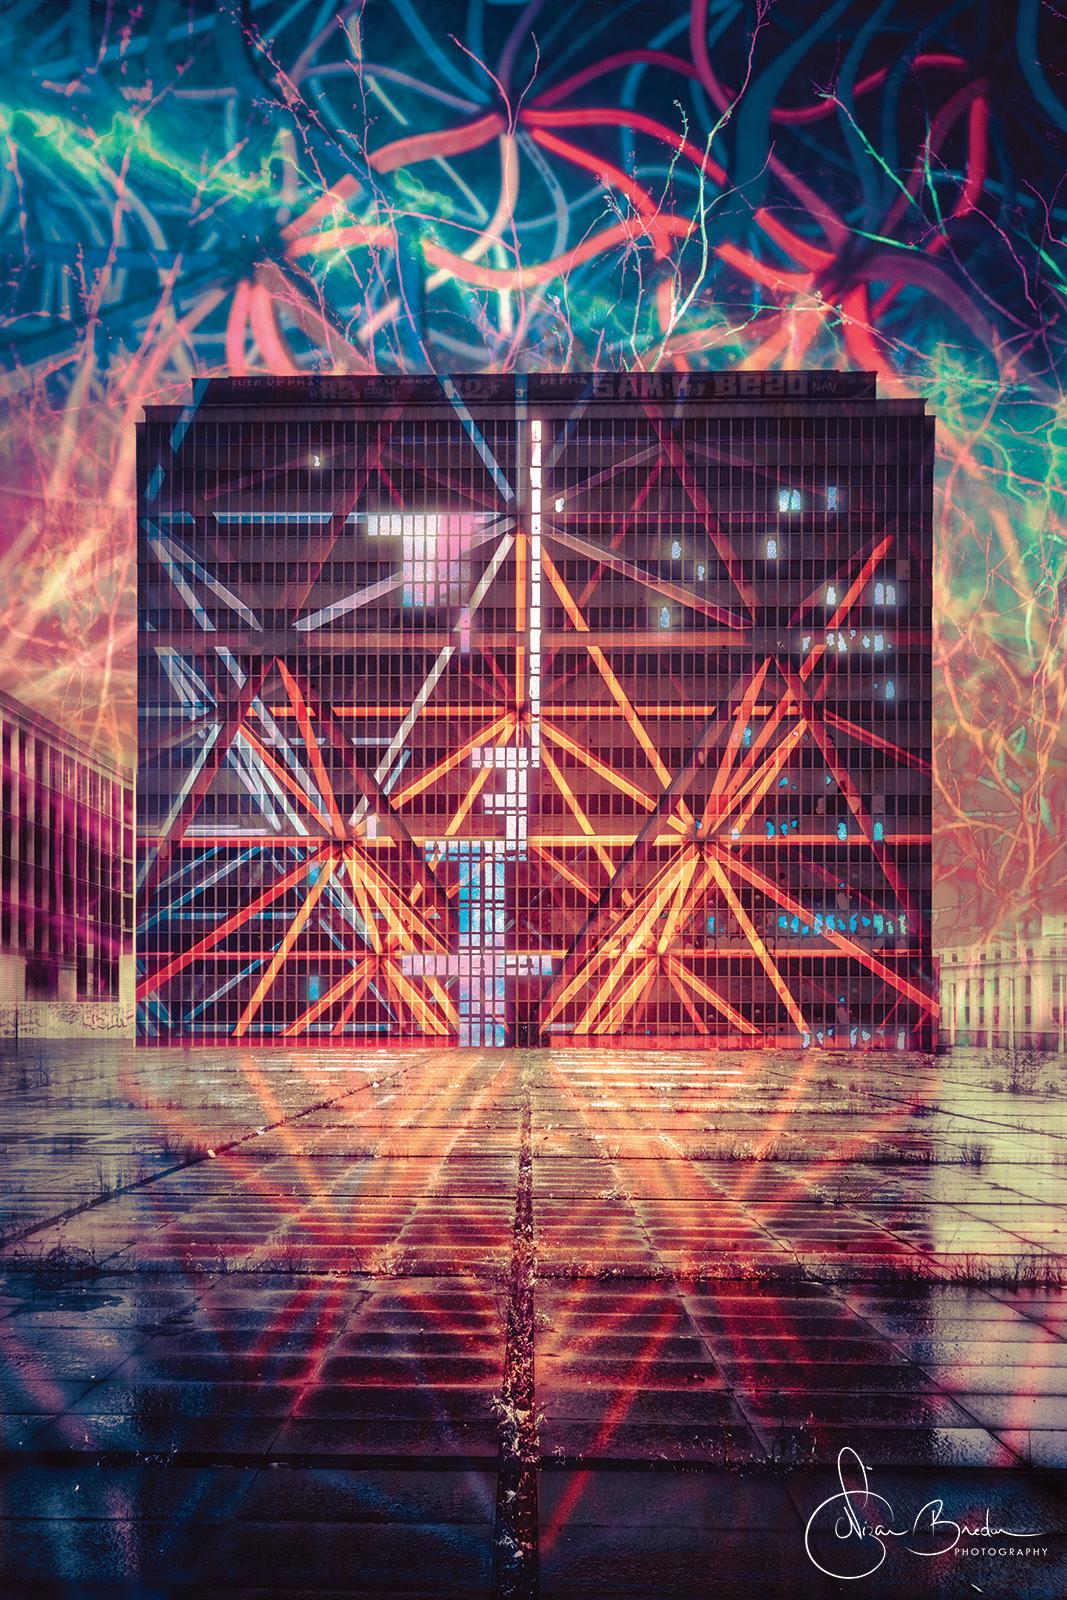 1_Frenzy Lights_RGB_Nizar Bredan.jpg